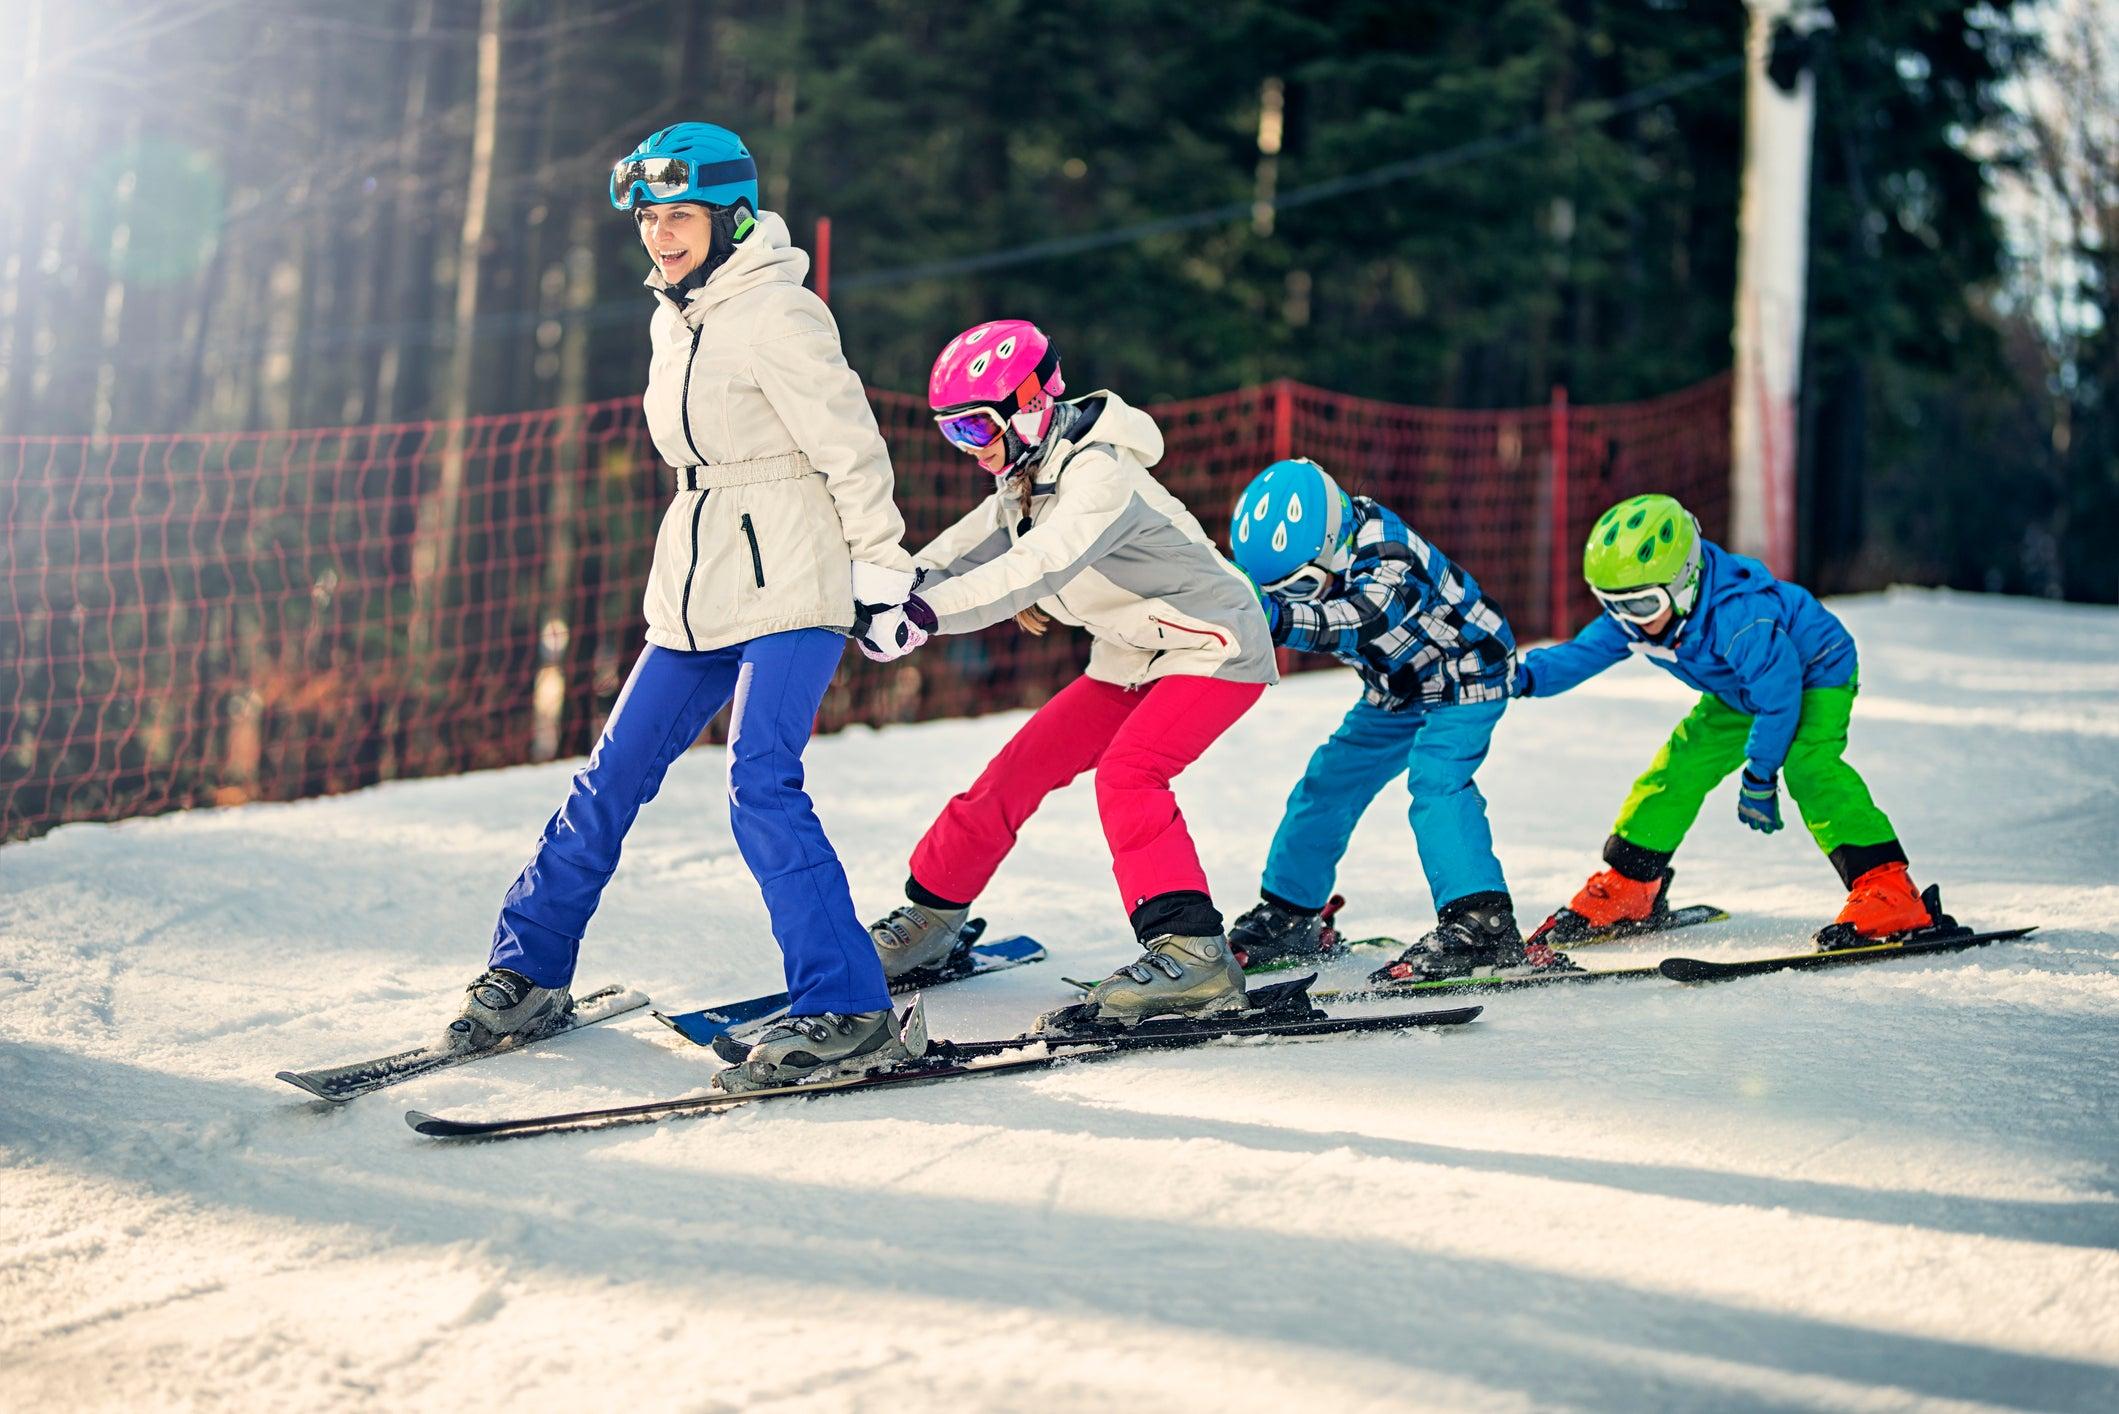 Kids ski free: Save on your family's next ski vacation